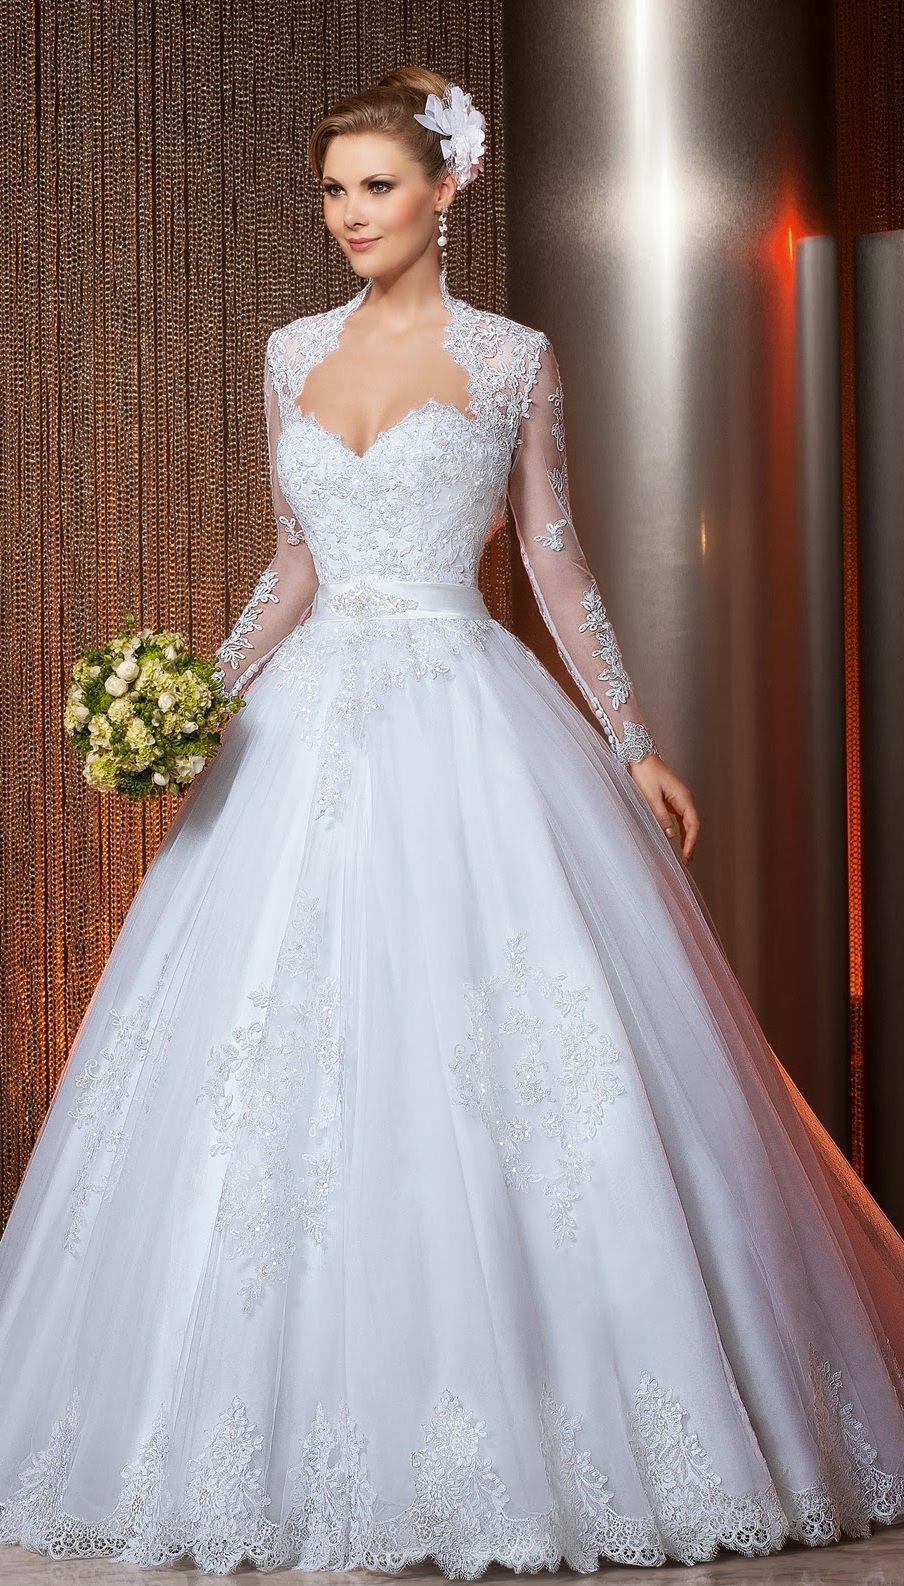 Traditional Style Wedding Dress Via Sposa Lace Princess Wedding Dresses Wedding Dresses White Lace Wedding Dress